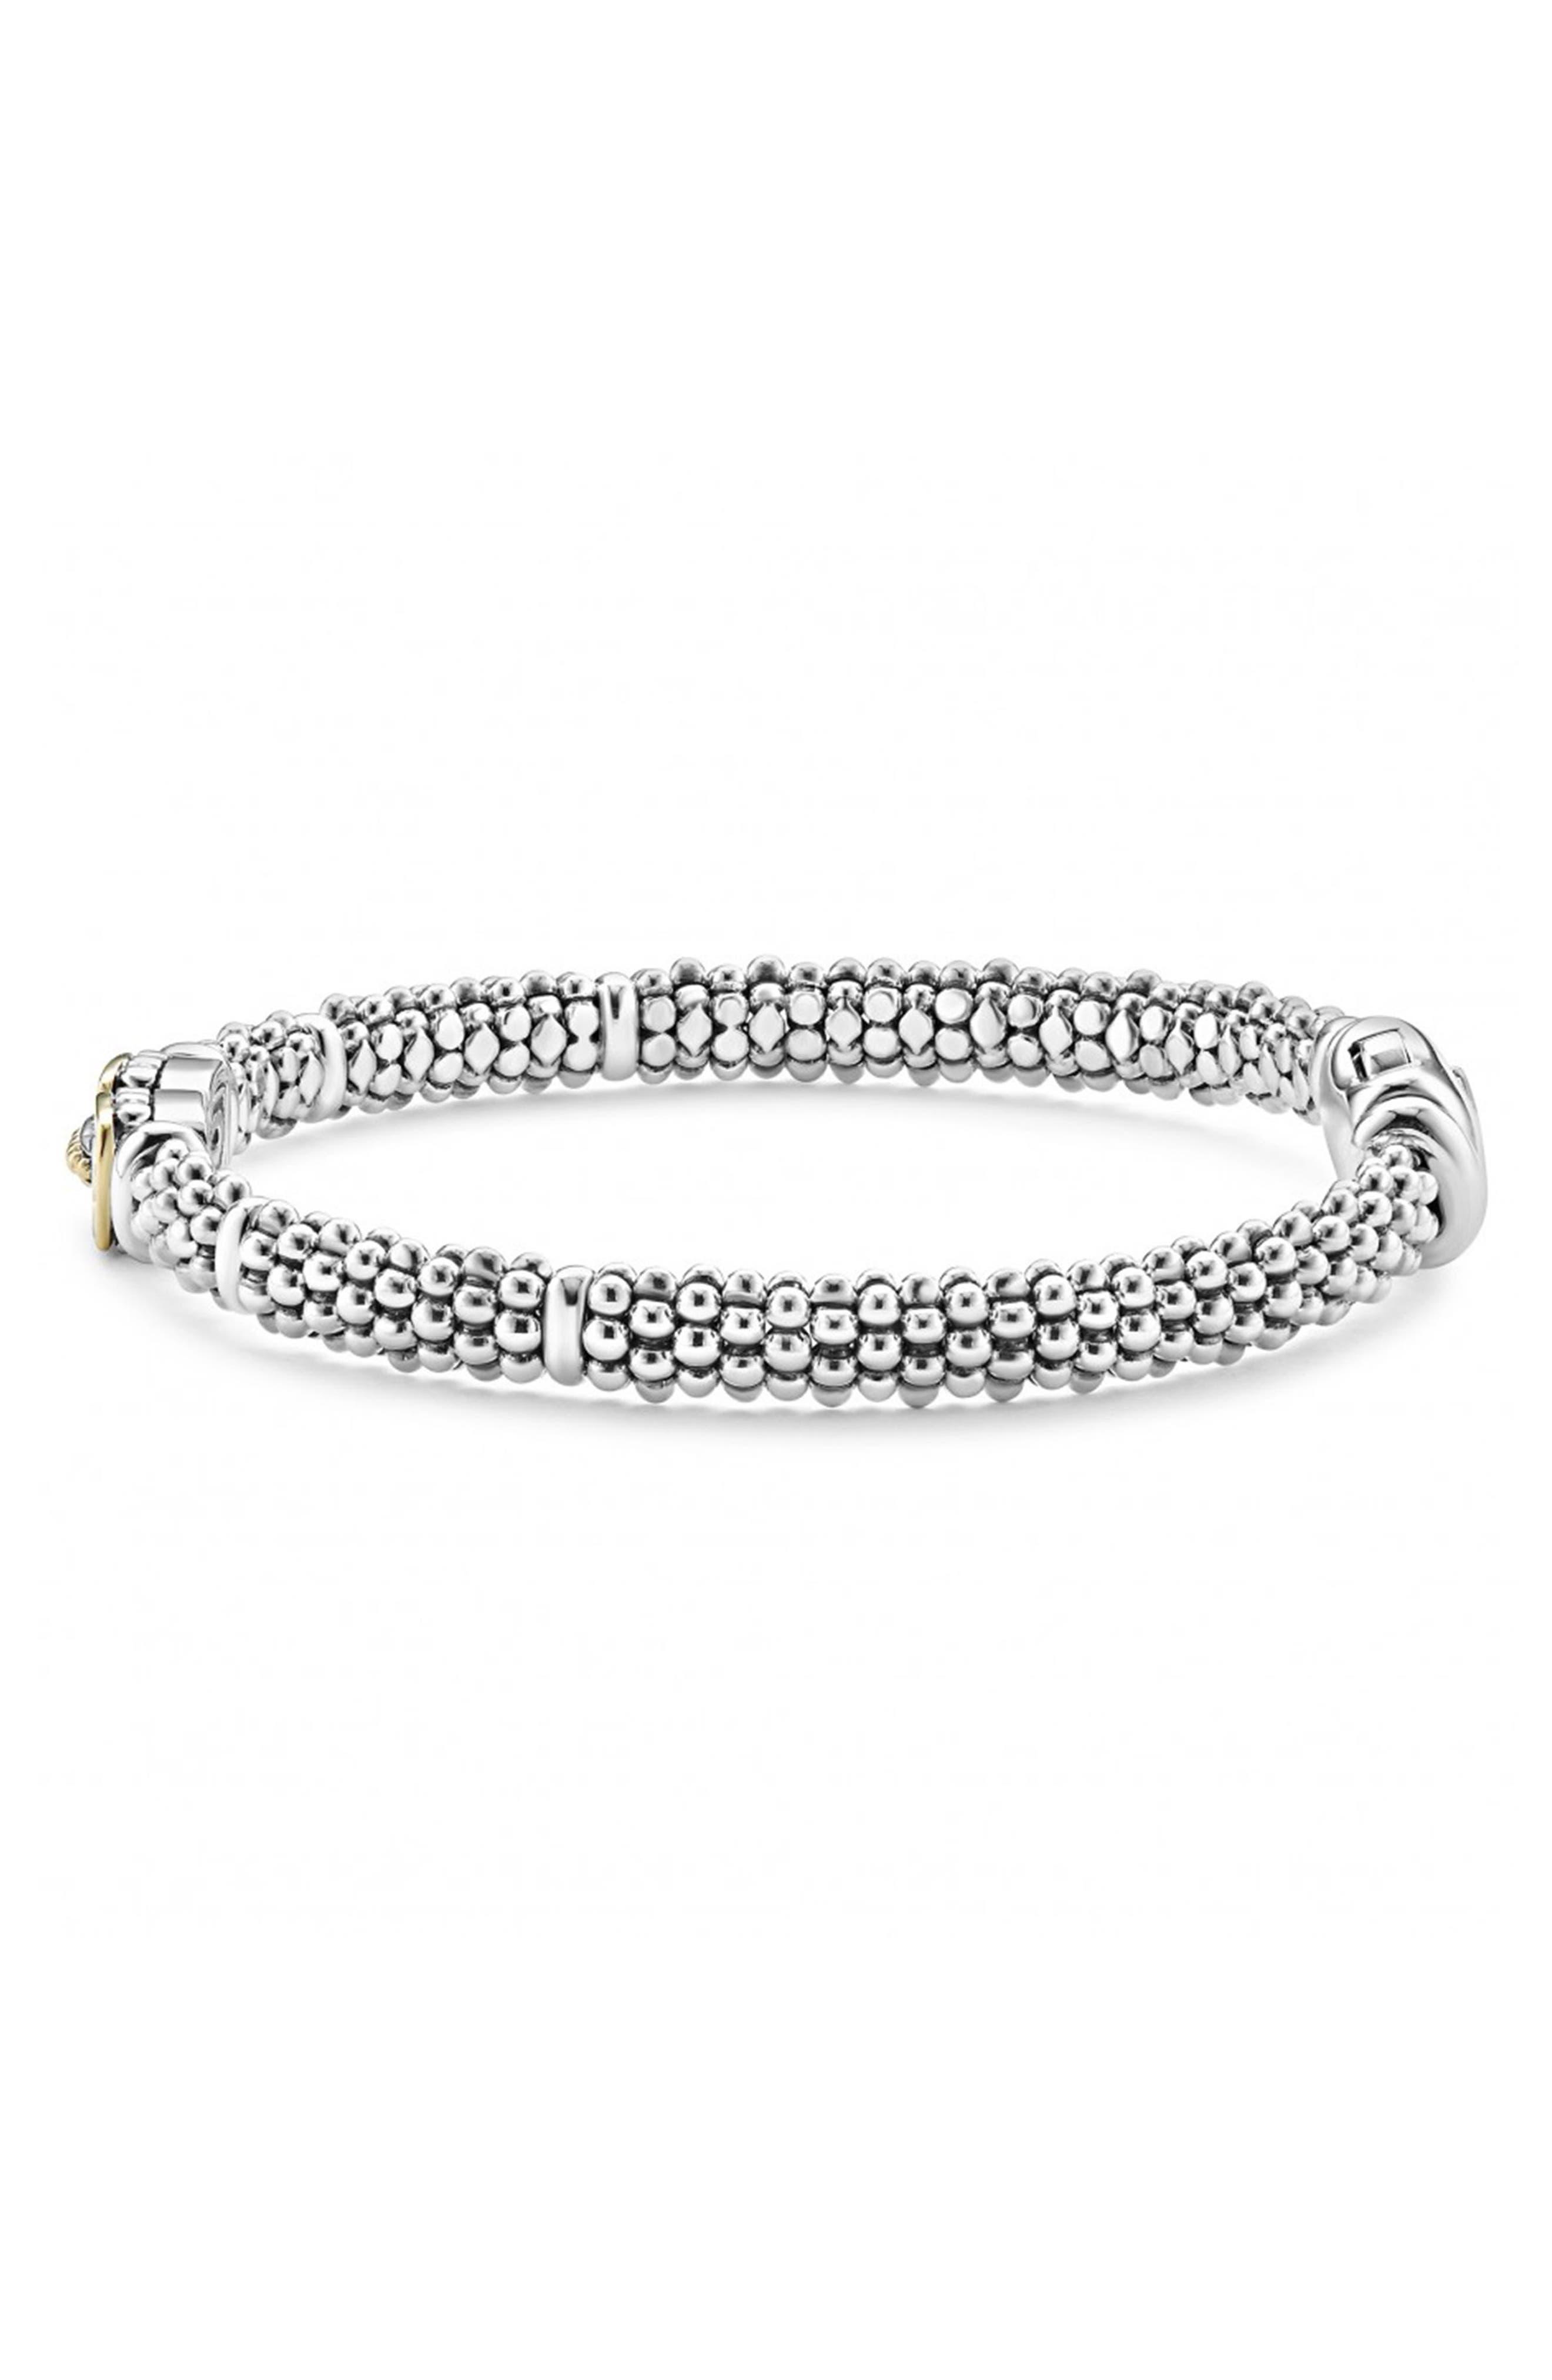 Diamond Caviar Bracelet,                             Alternate thumbnail 5, color,                             040